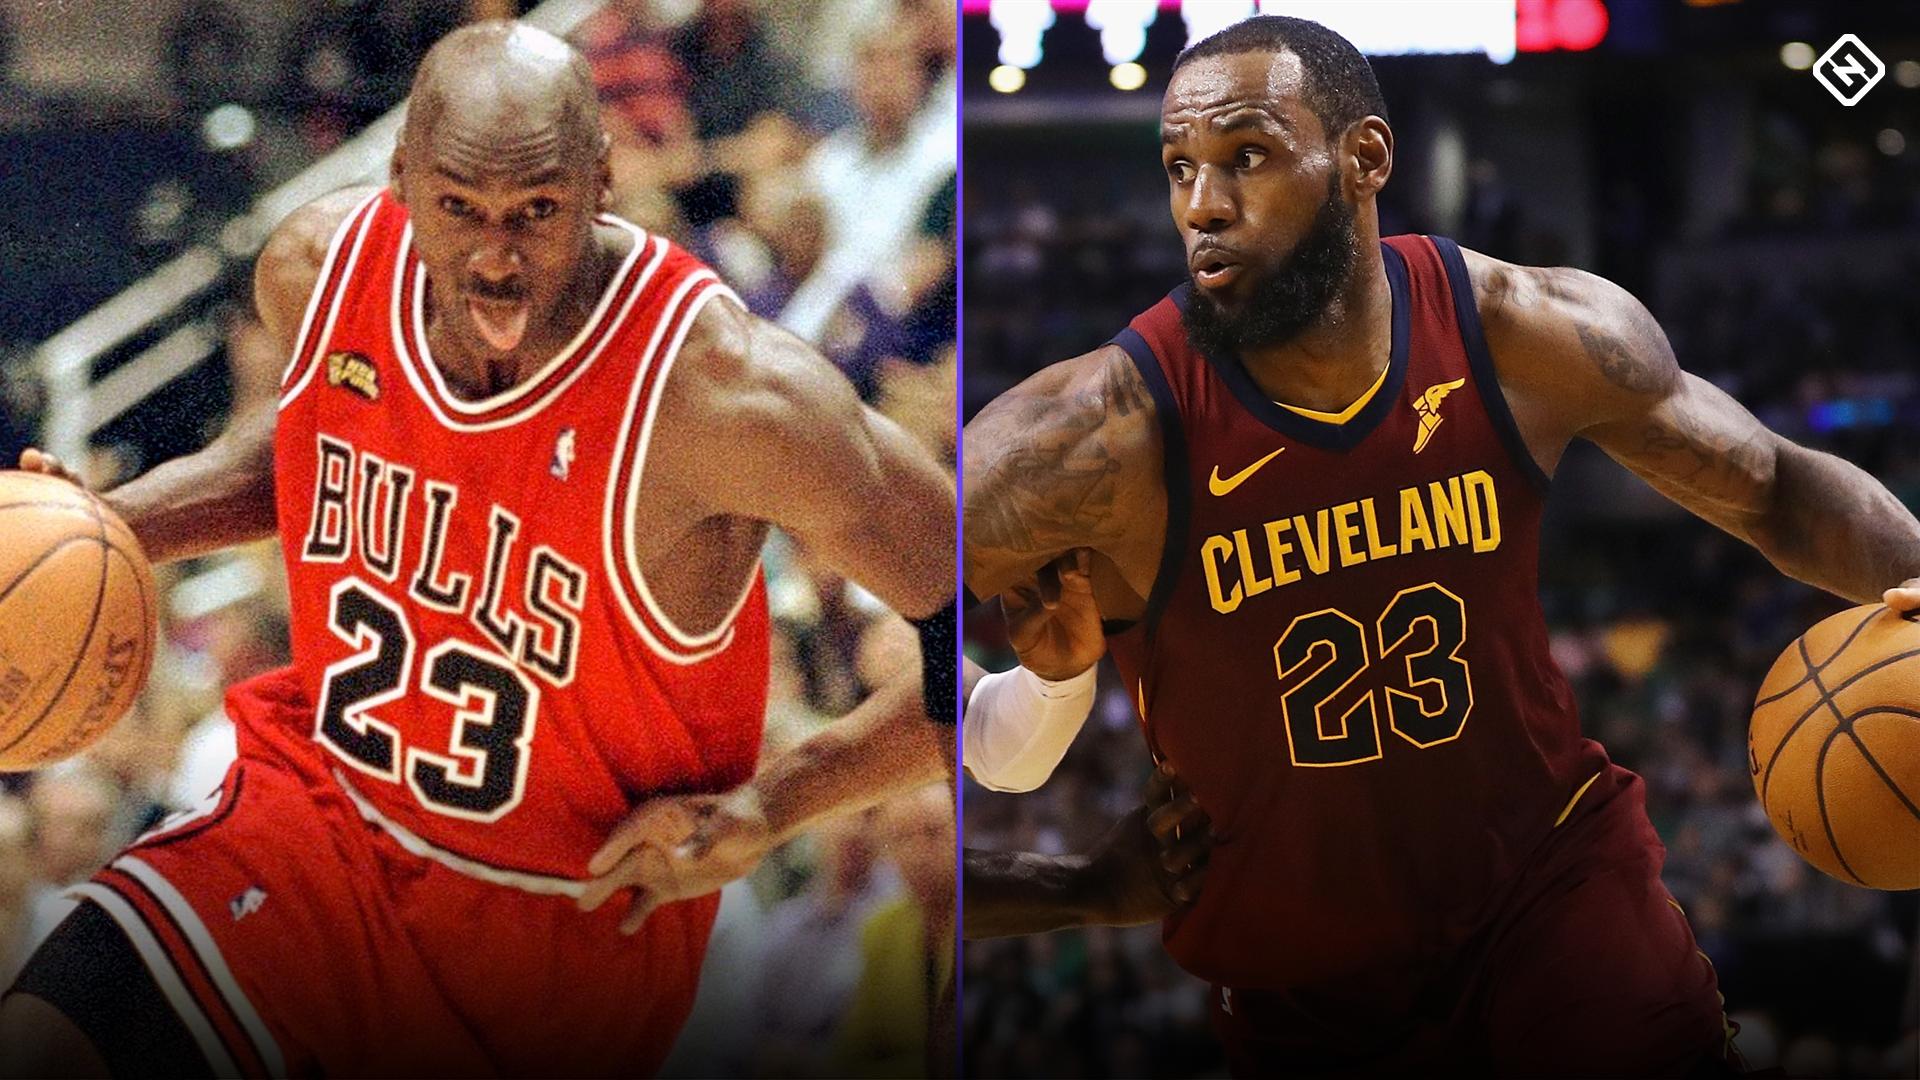 Incorrecto A veces a veces Vulgaridad  In Michael Jordan vs. LeBron James debate, dissecting legacies is wrong  approach | Sporting News